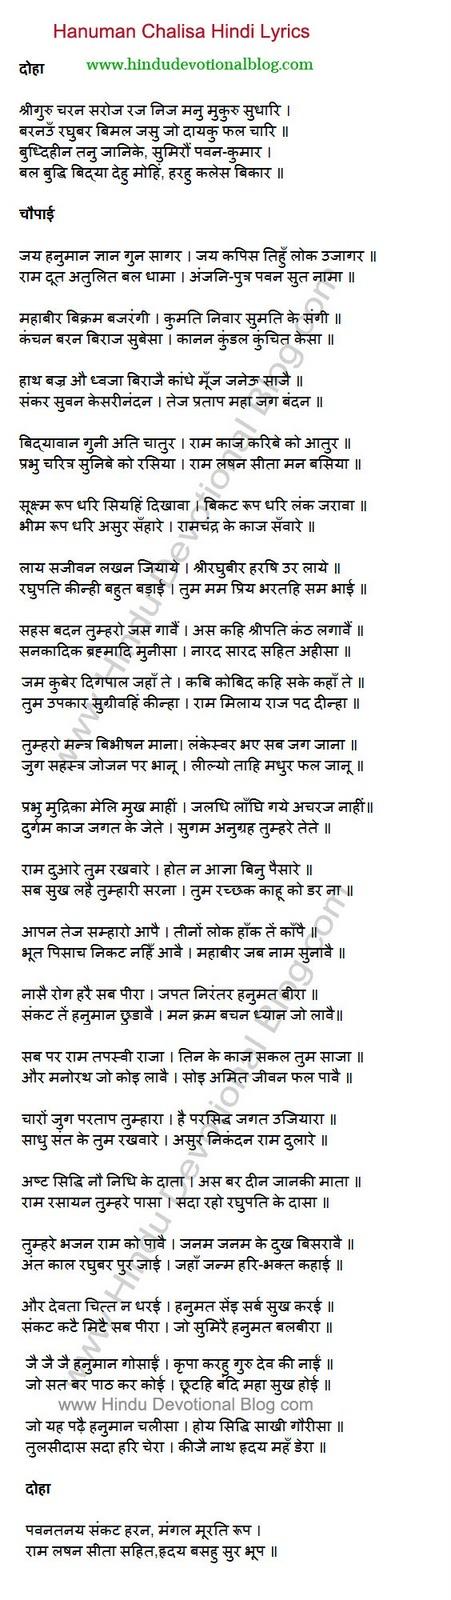 Hanuman chalisa|हनुमान चालीसा (lyrics in hindi-english.